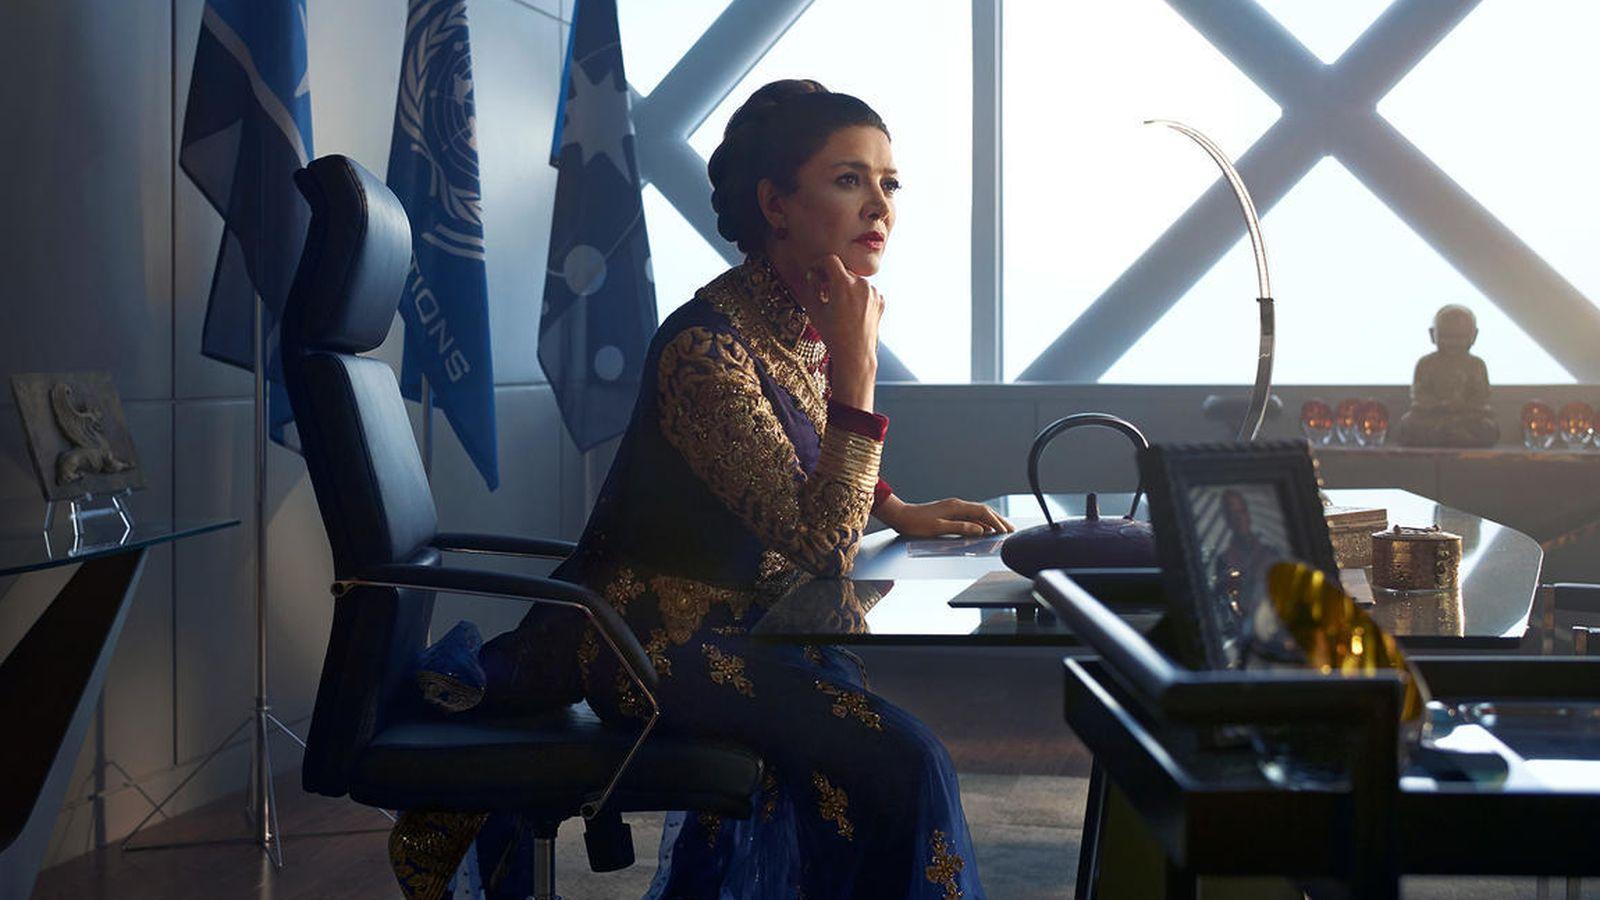 Seriálové okénko: The Expanse - nový král mezi scifi seriály? 13174